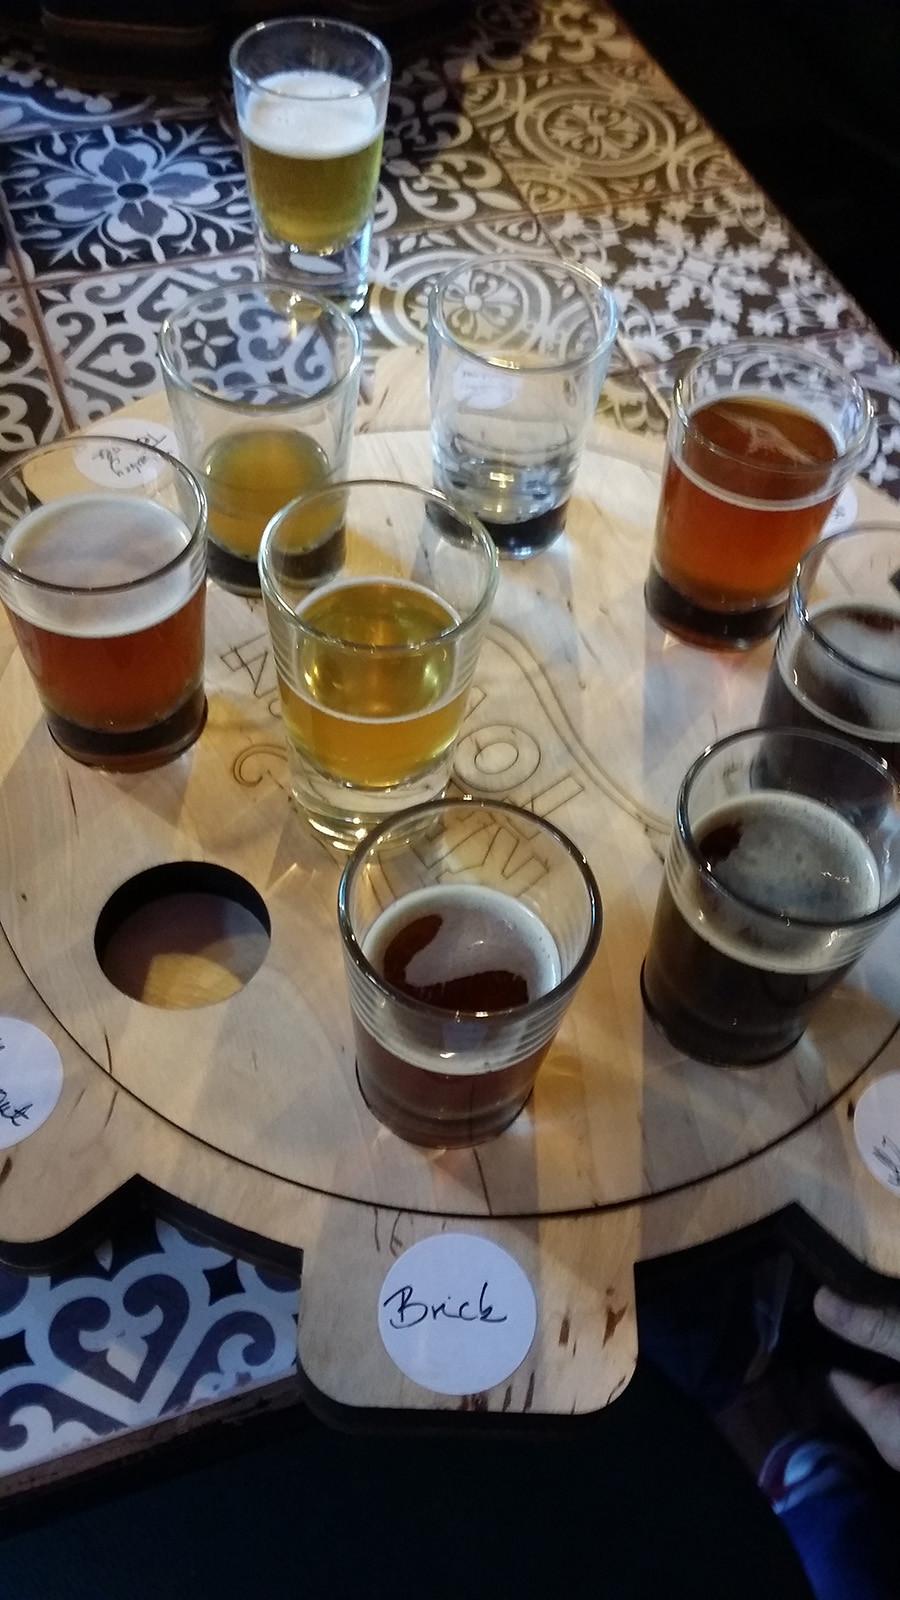 Kraft sör kínálat